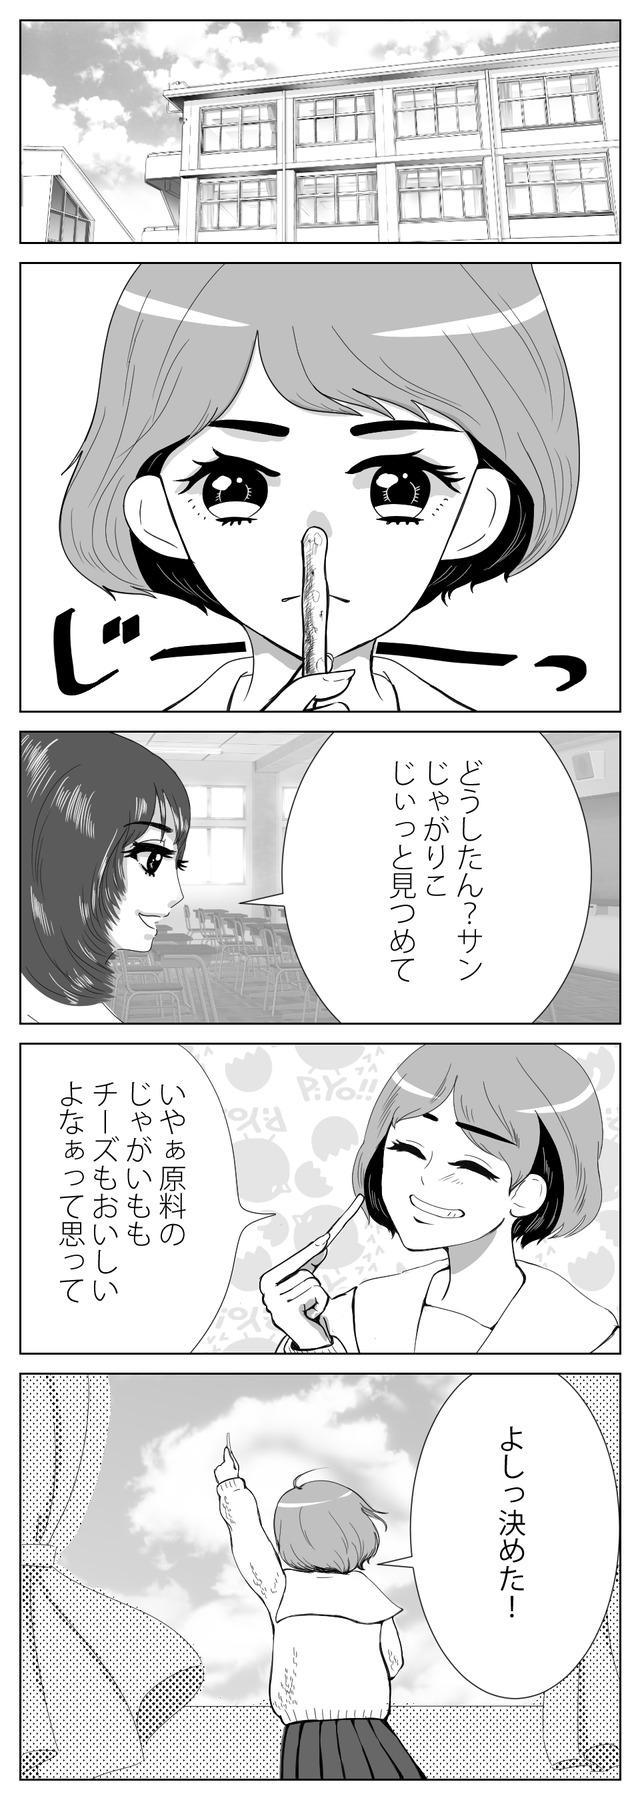 omoshirosuki01